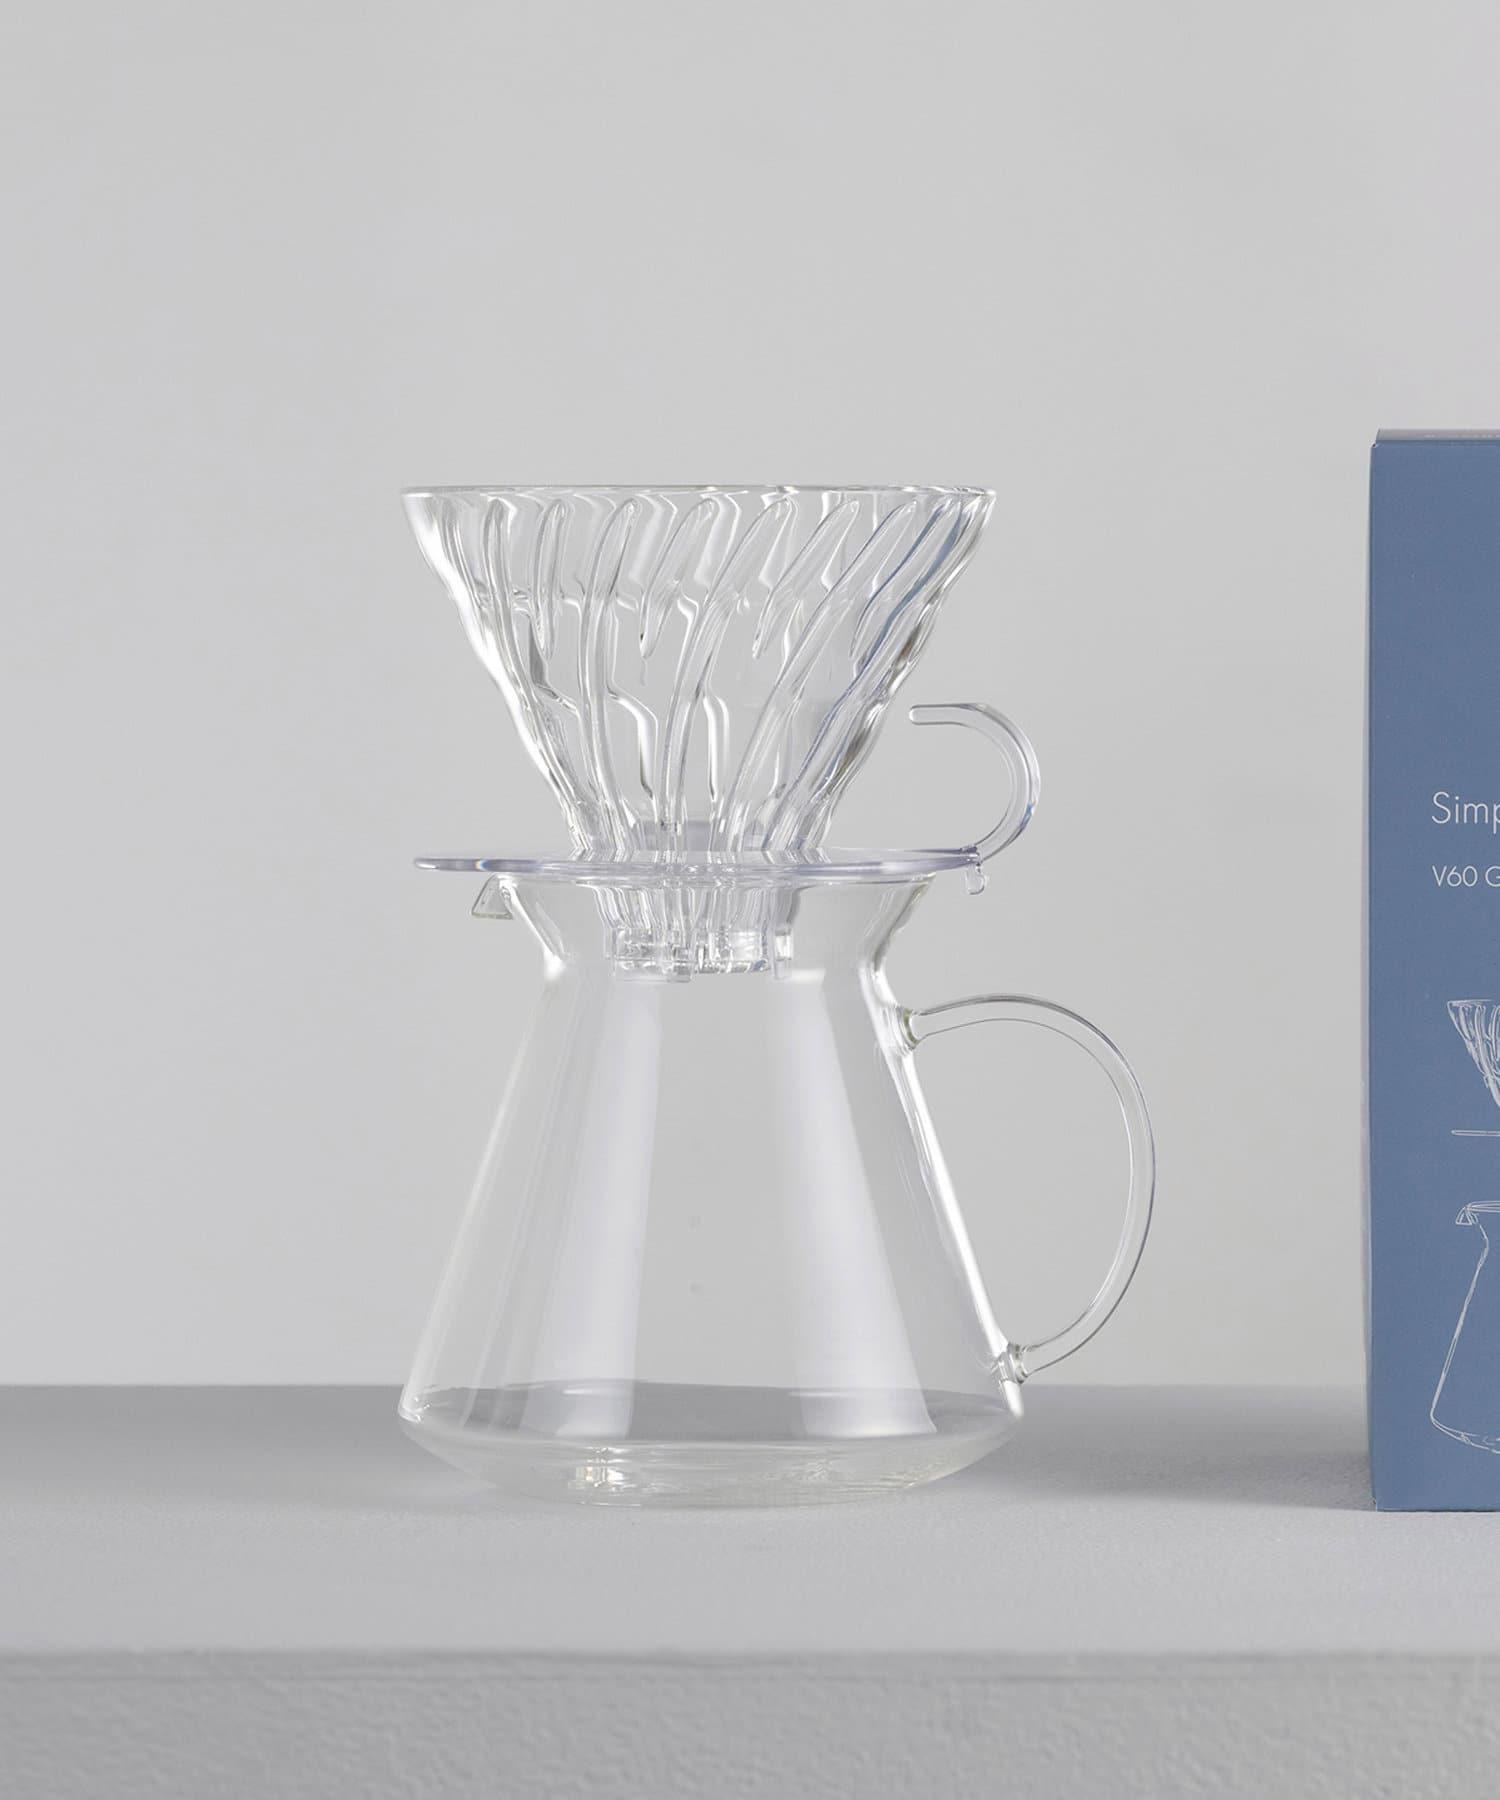 CIAOPANIC TYPY(チャオパニックティピー) ライフスタイル 【HARIO/ハリオ】V60ガラス醸造キット600ml クリア